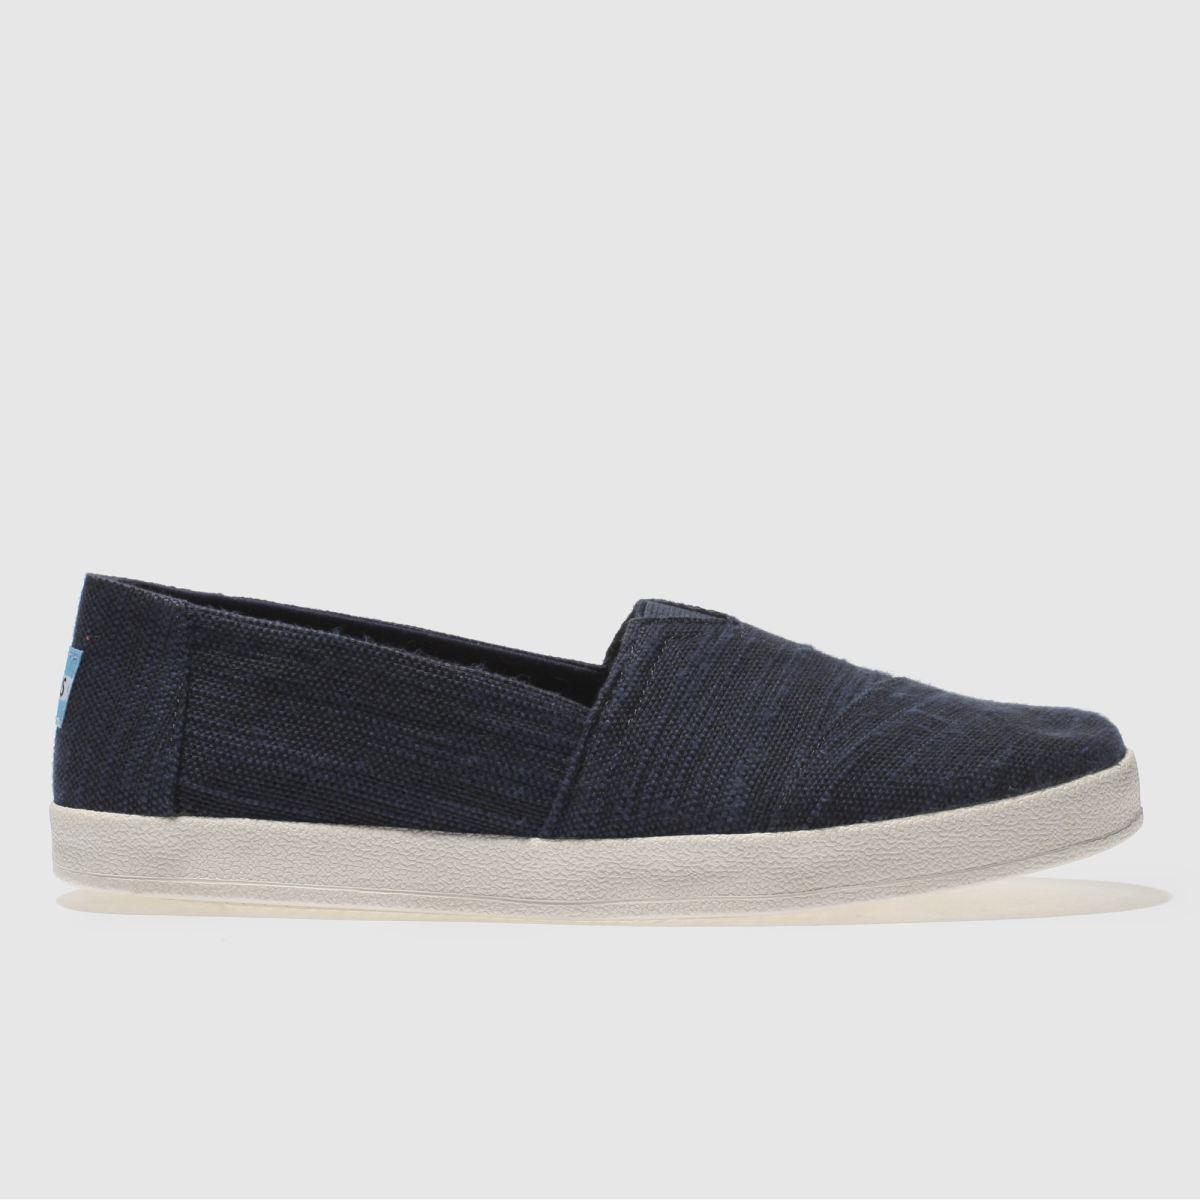 Toms Navy Avalon Flat Shoes